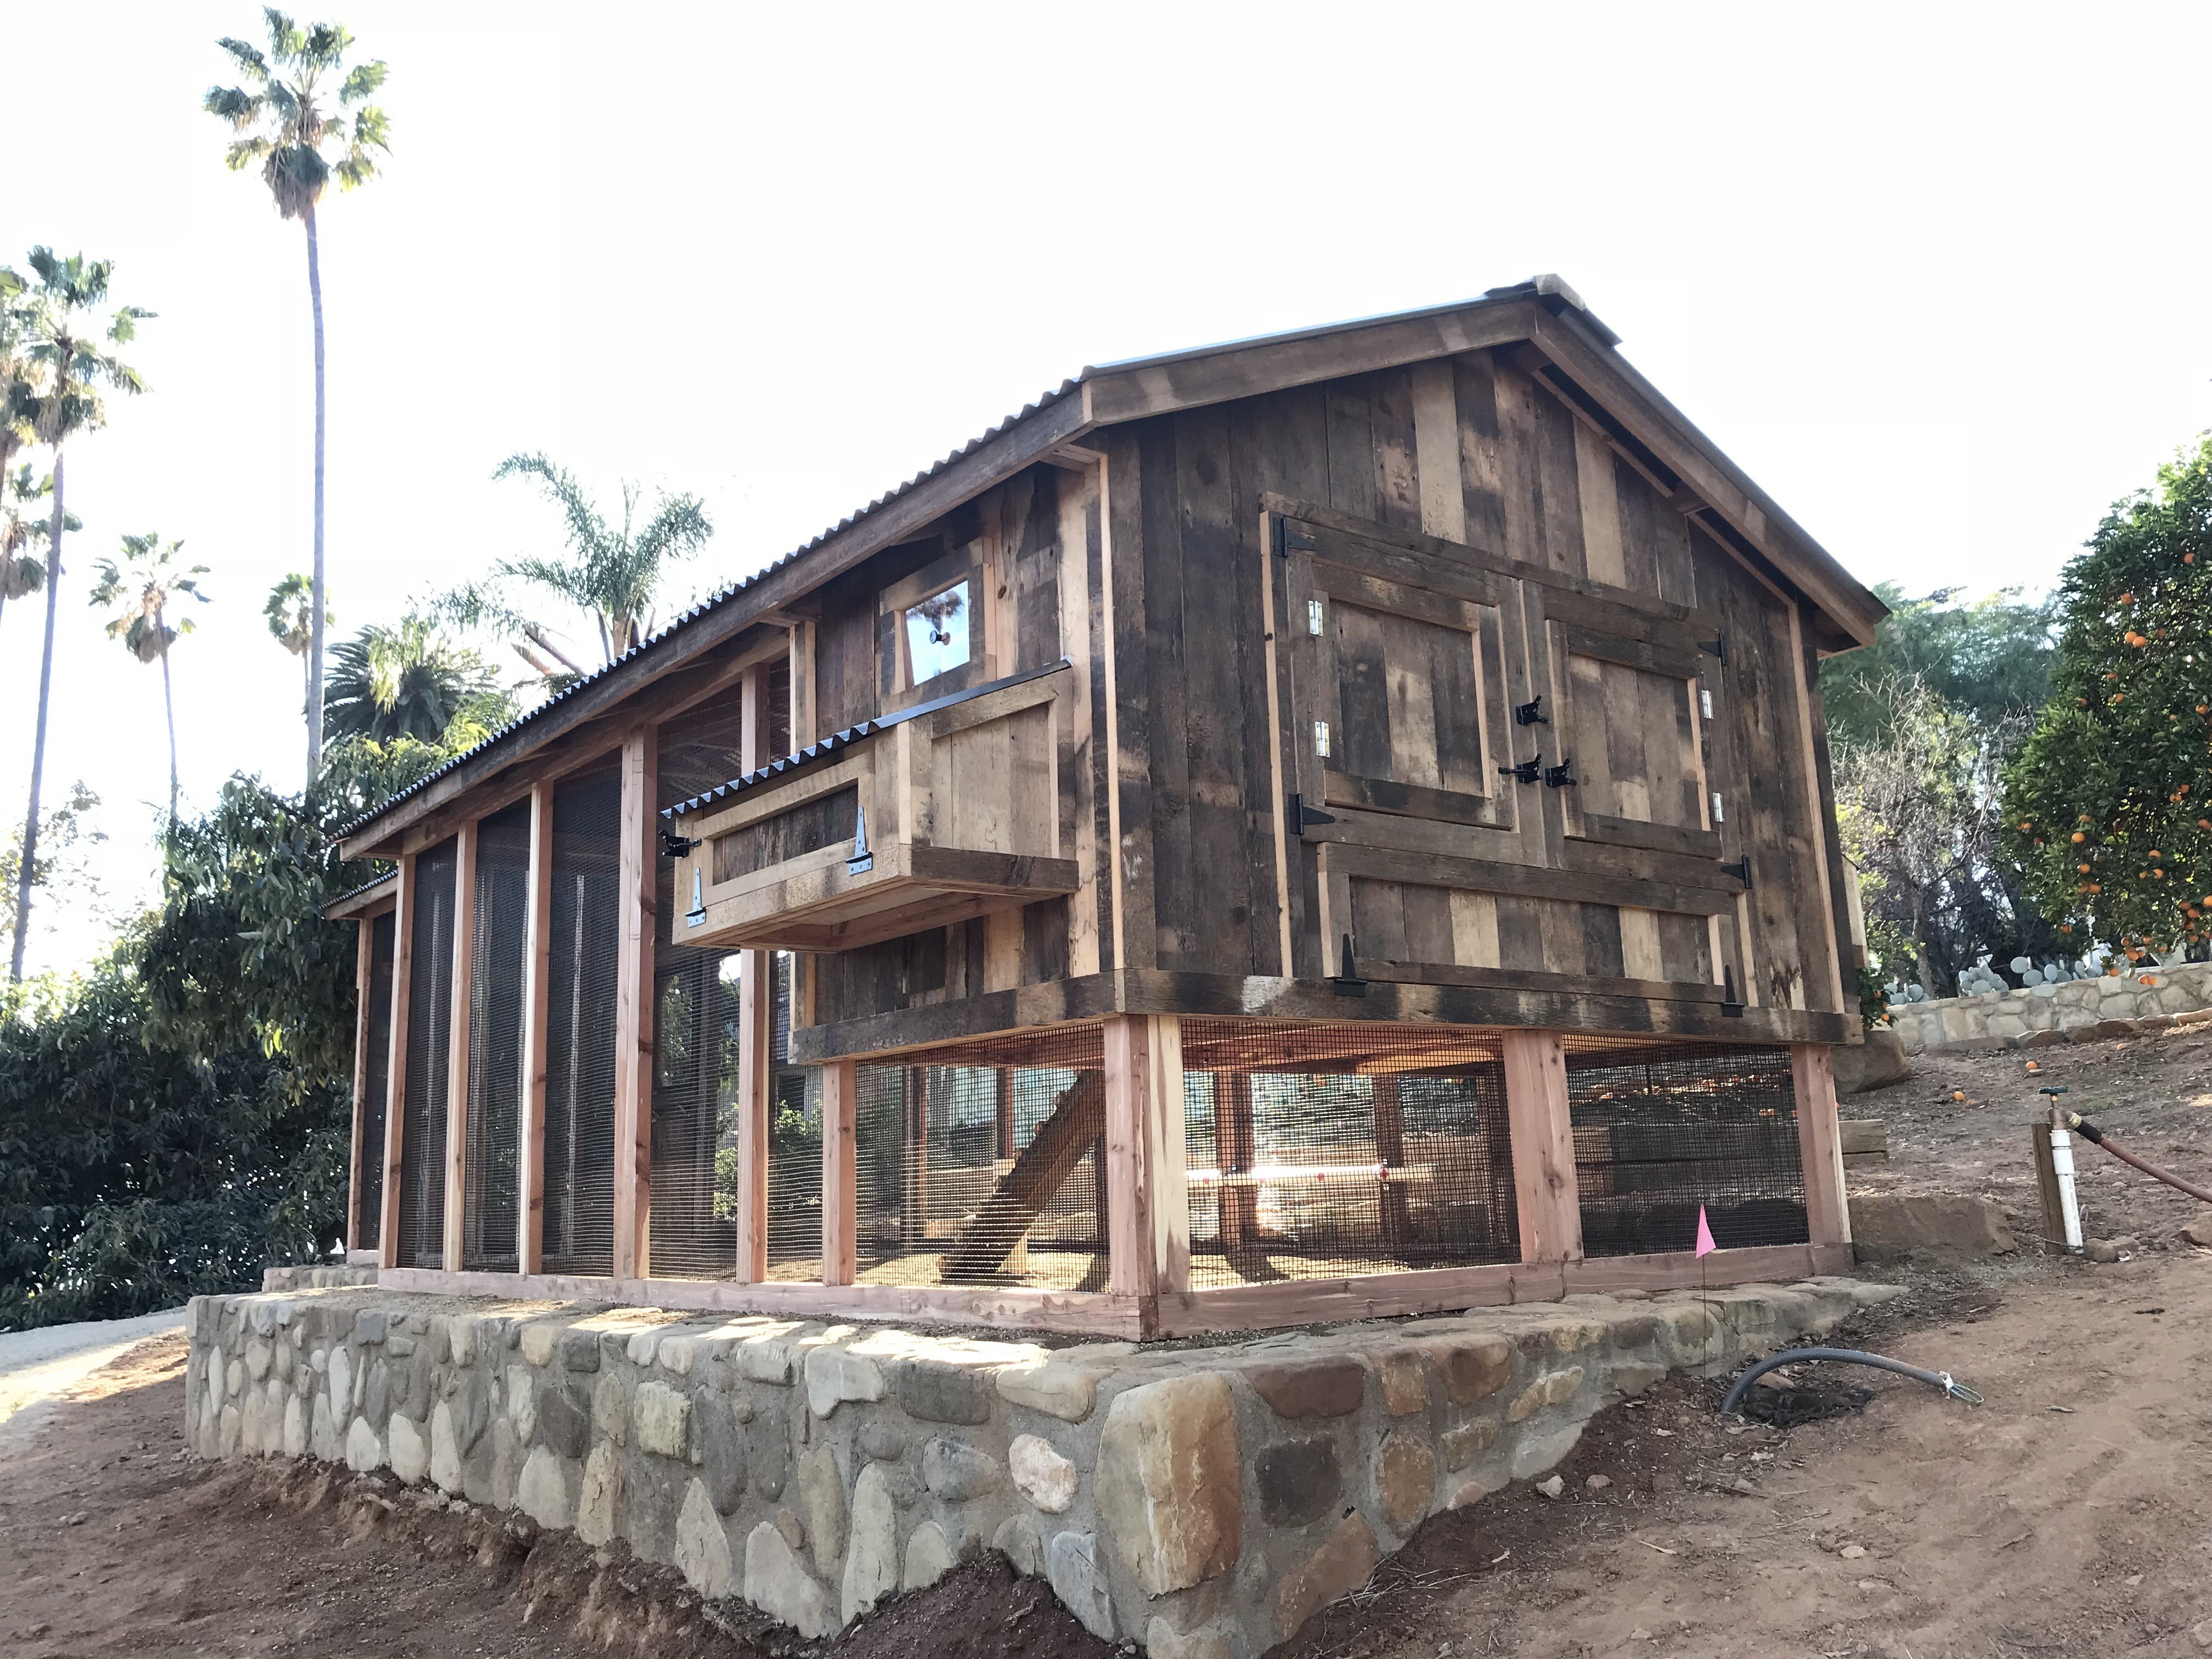 Red cedar reclaimed barn wood coop with saltbox roof in Ojai, CA (6)